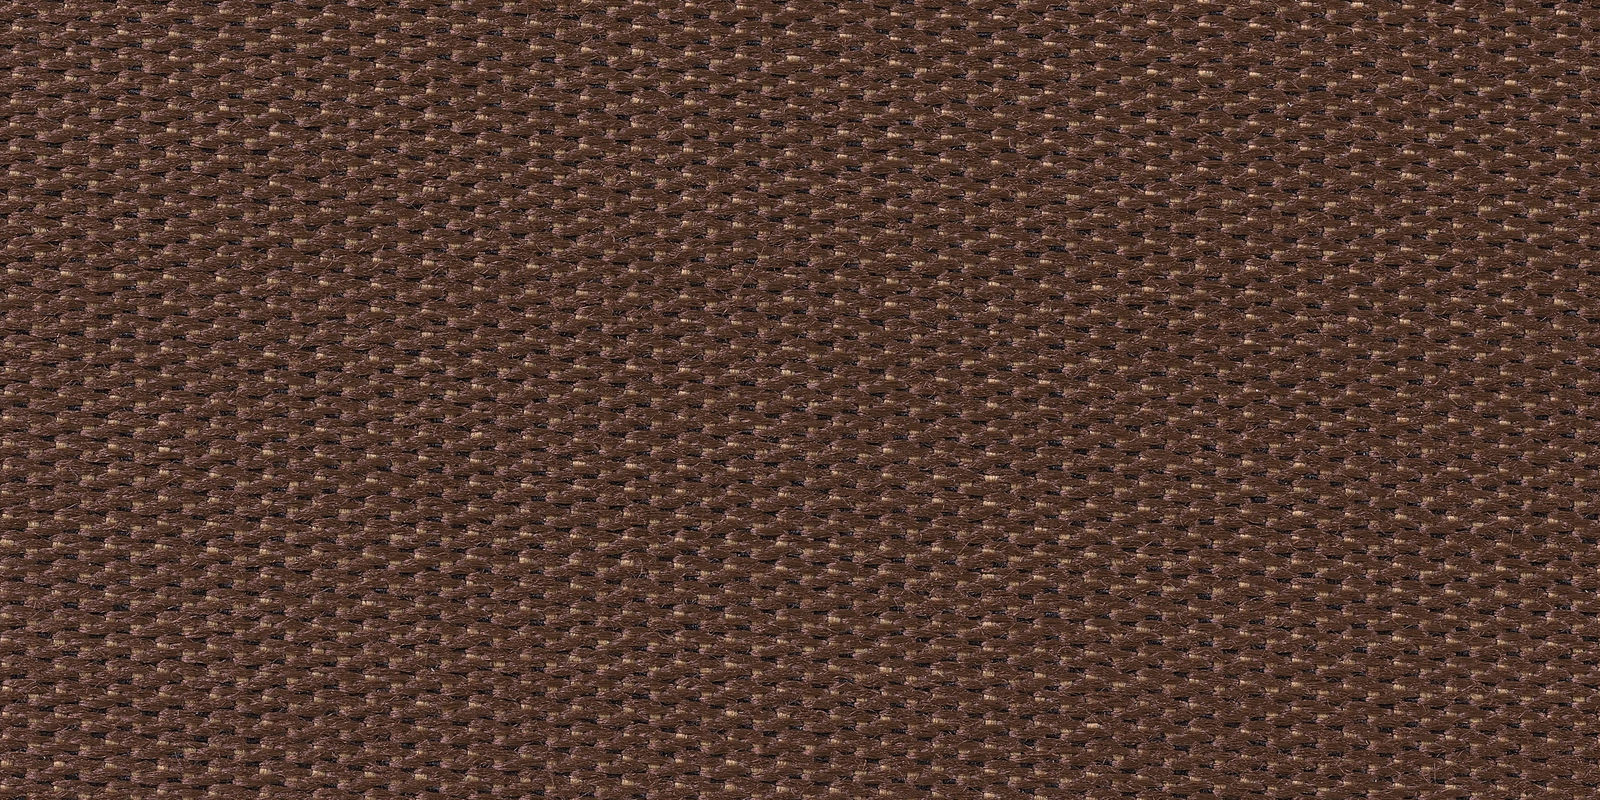 Pleno коричневый (велюр)